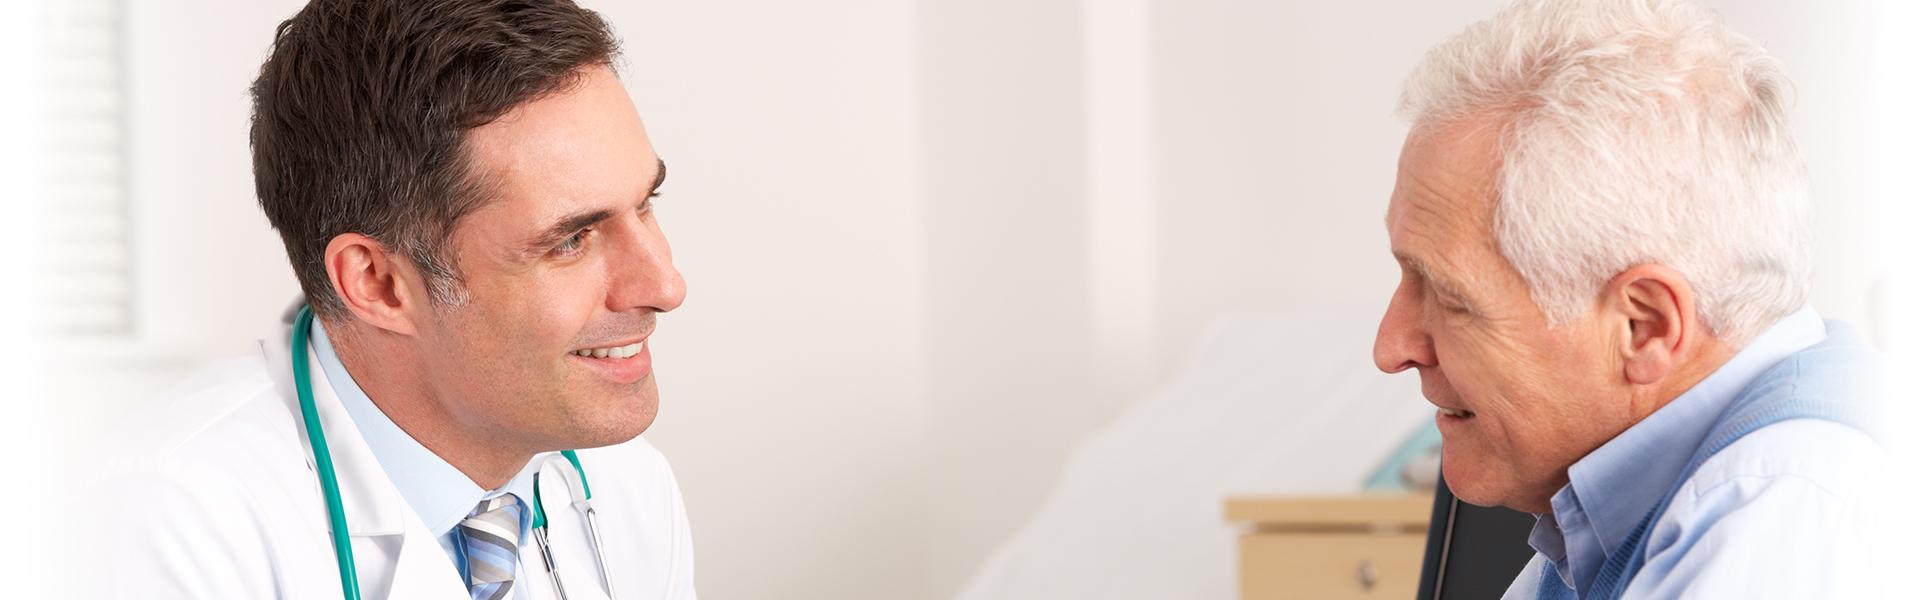 como-diagnostico-orthoapnea